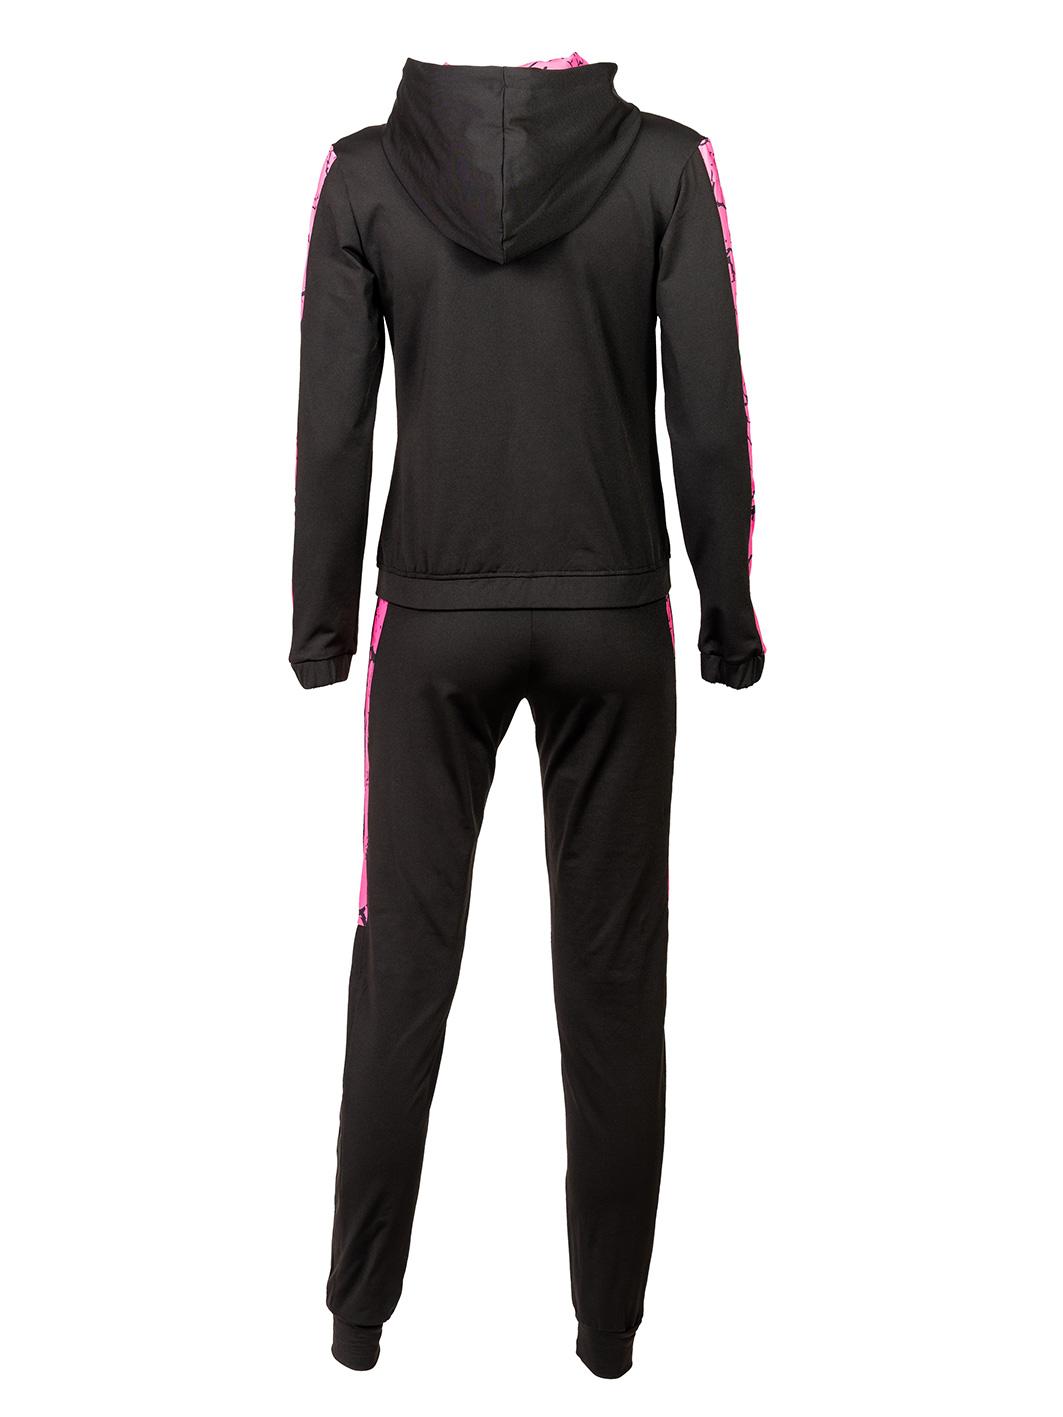 ženska trenerka crno roza